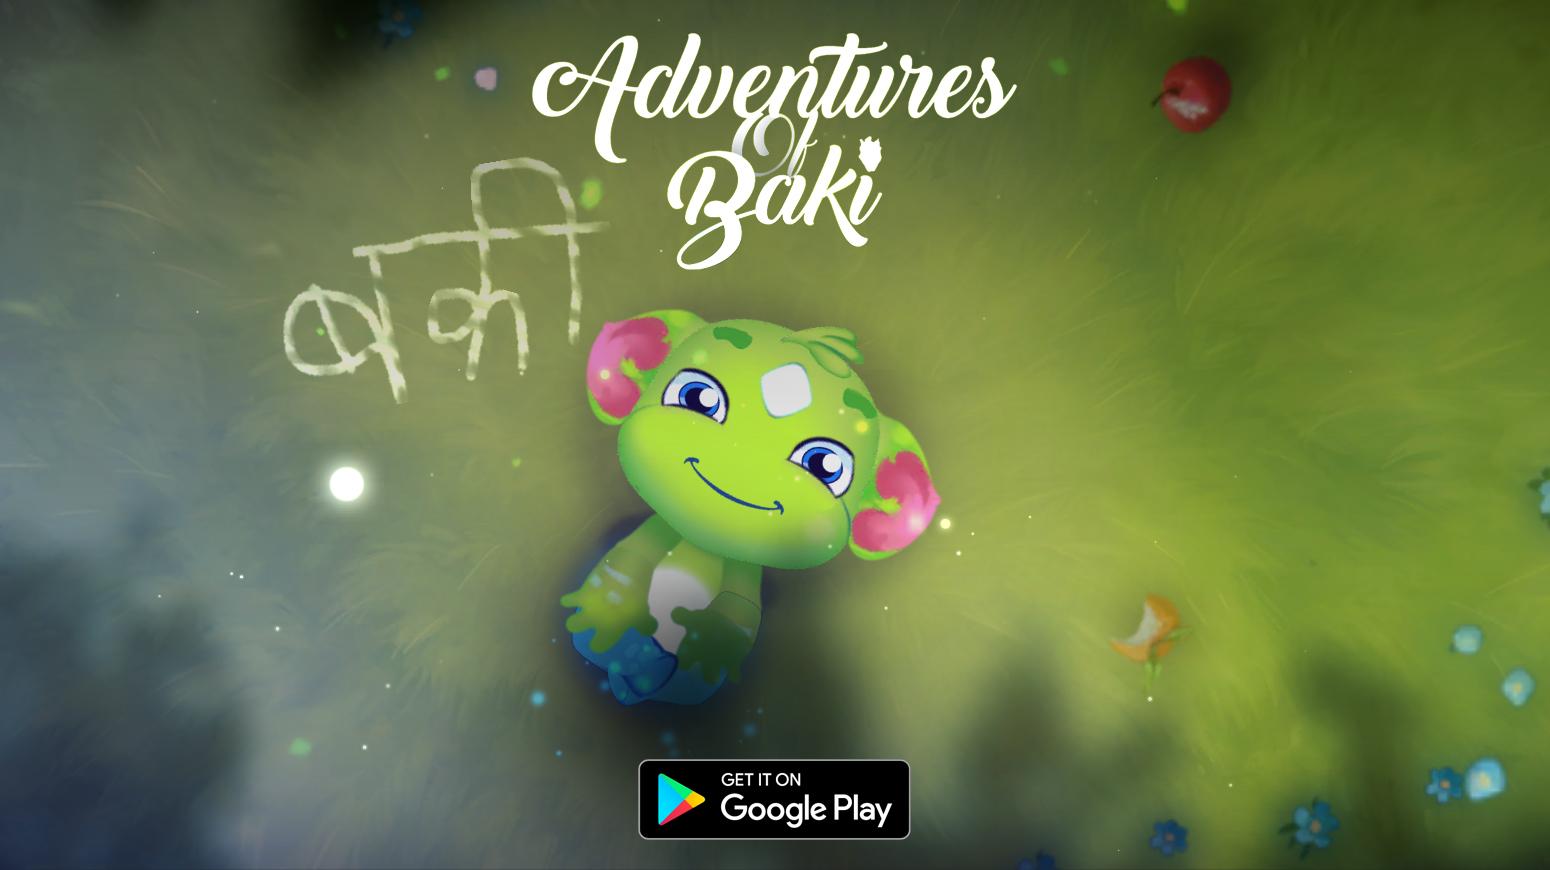 Adventures of Baki